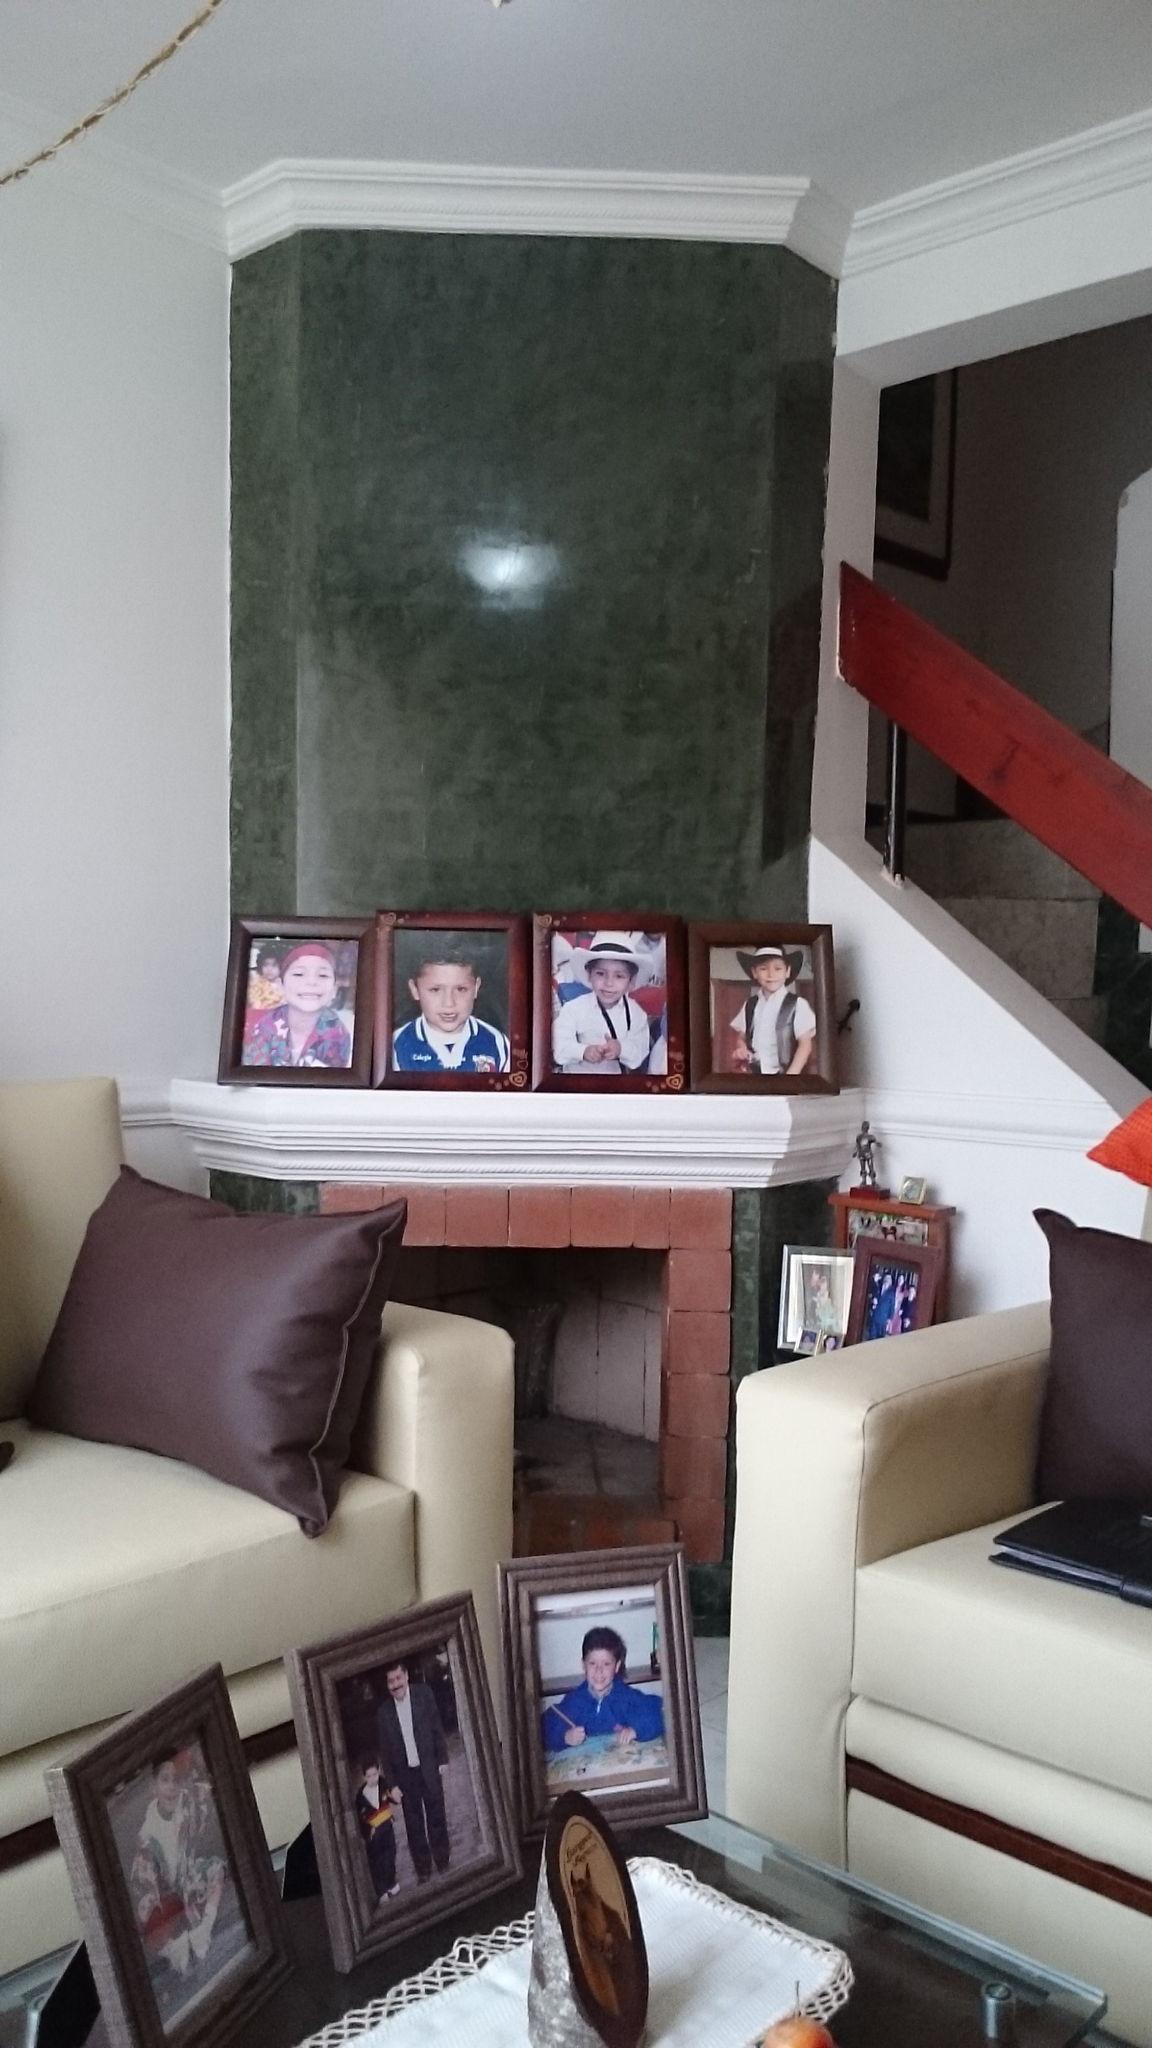 Vendo Casa 88m2 Conj Picadilly Norte Sn Cipriano # Muebles Cipriano